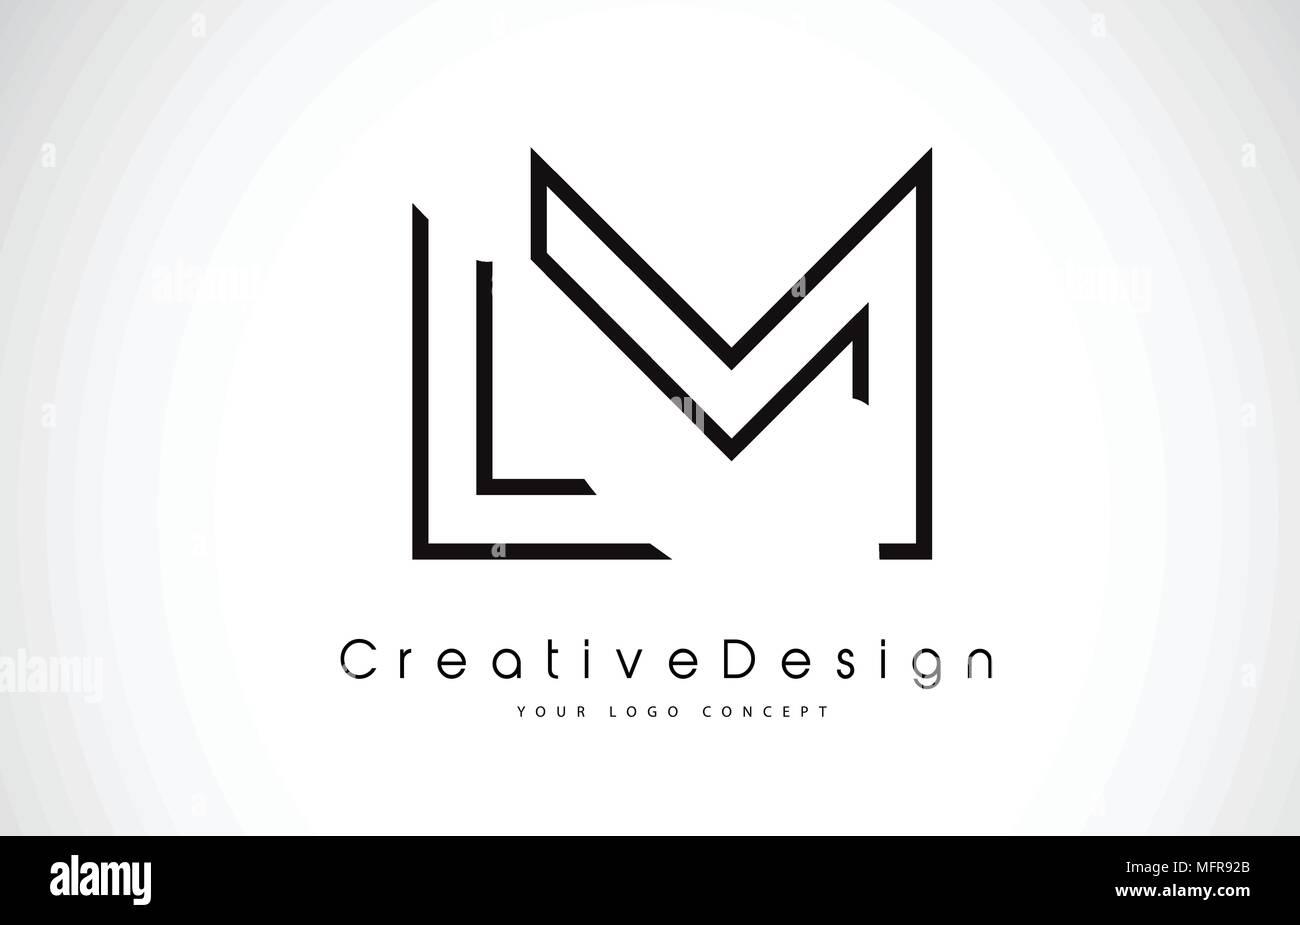 lm l m letter logo design in black colors creative modern letters